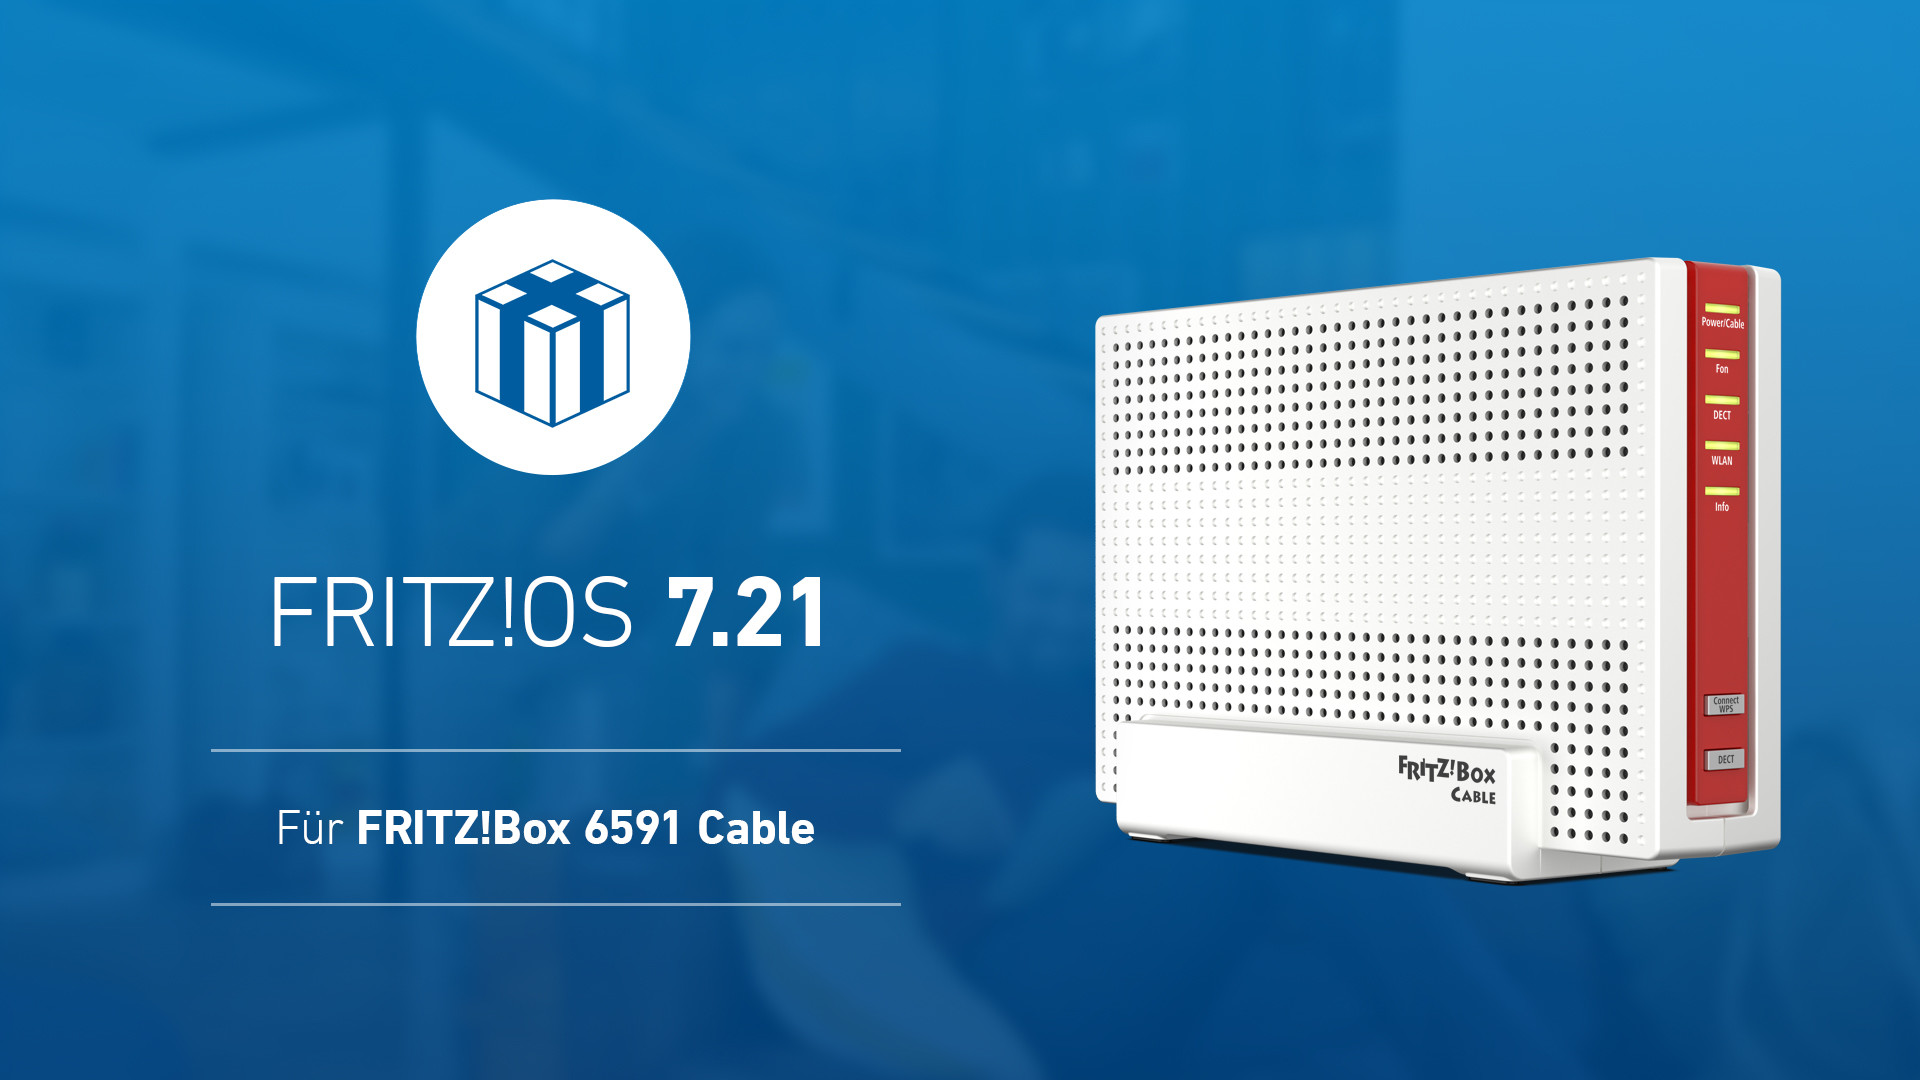 Fritzbox Update 7.20